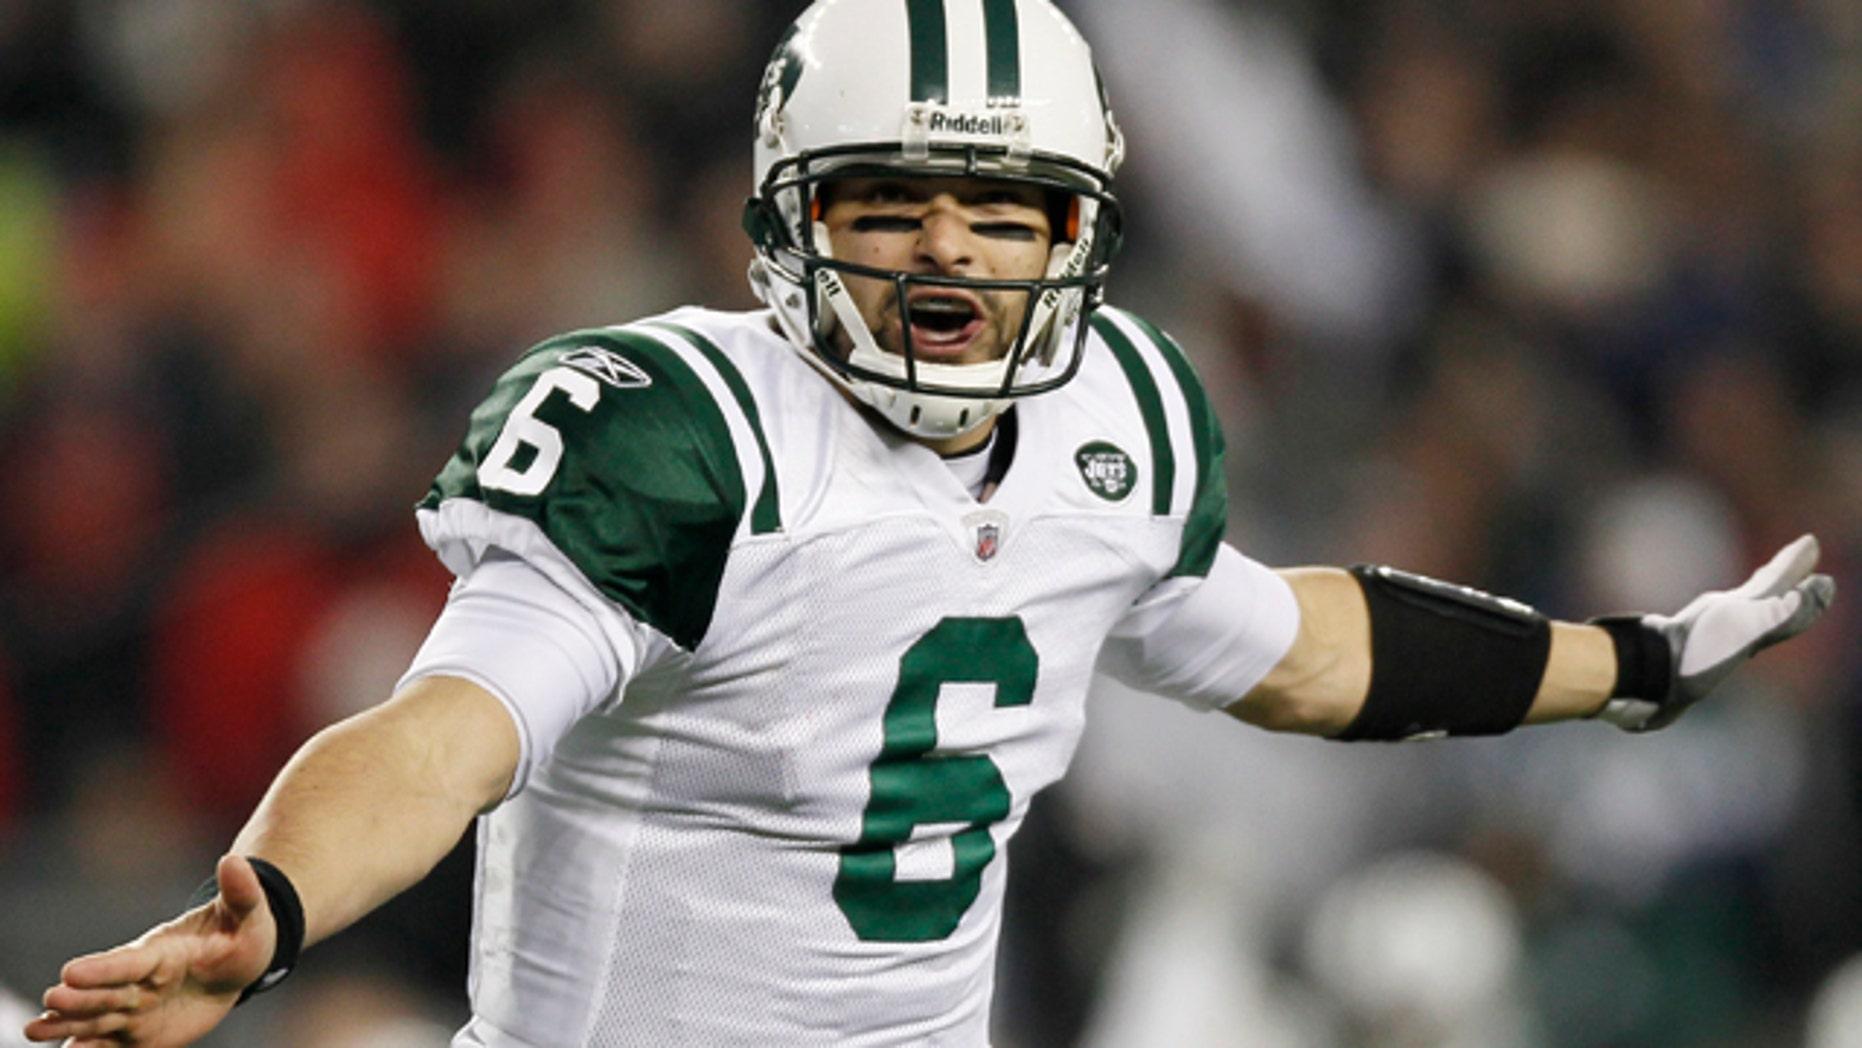 Jan. 16, 2011: New York Jets quarterback Mark Sanchez celebrates his touchdown pass to Santonio Holmes during the second half.